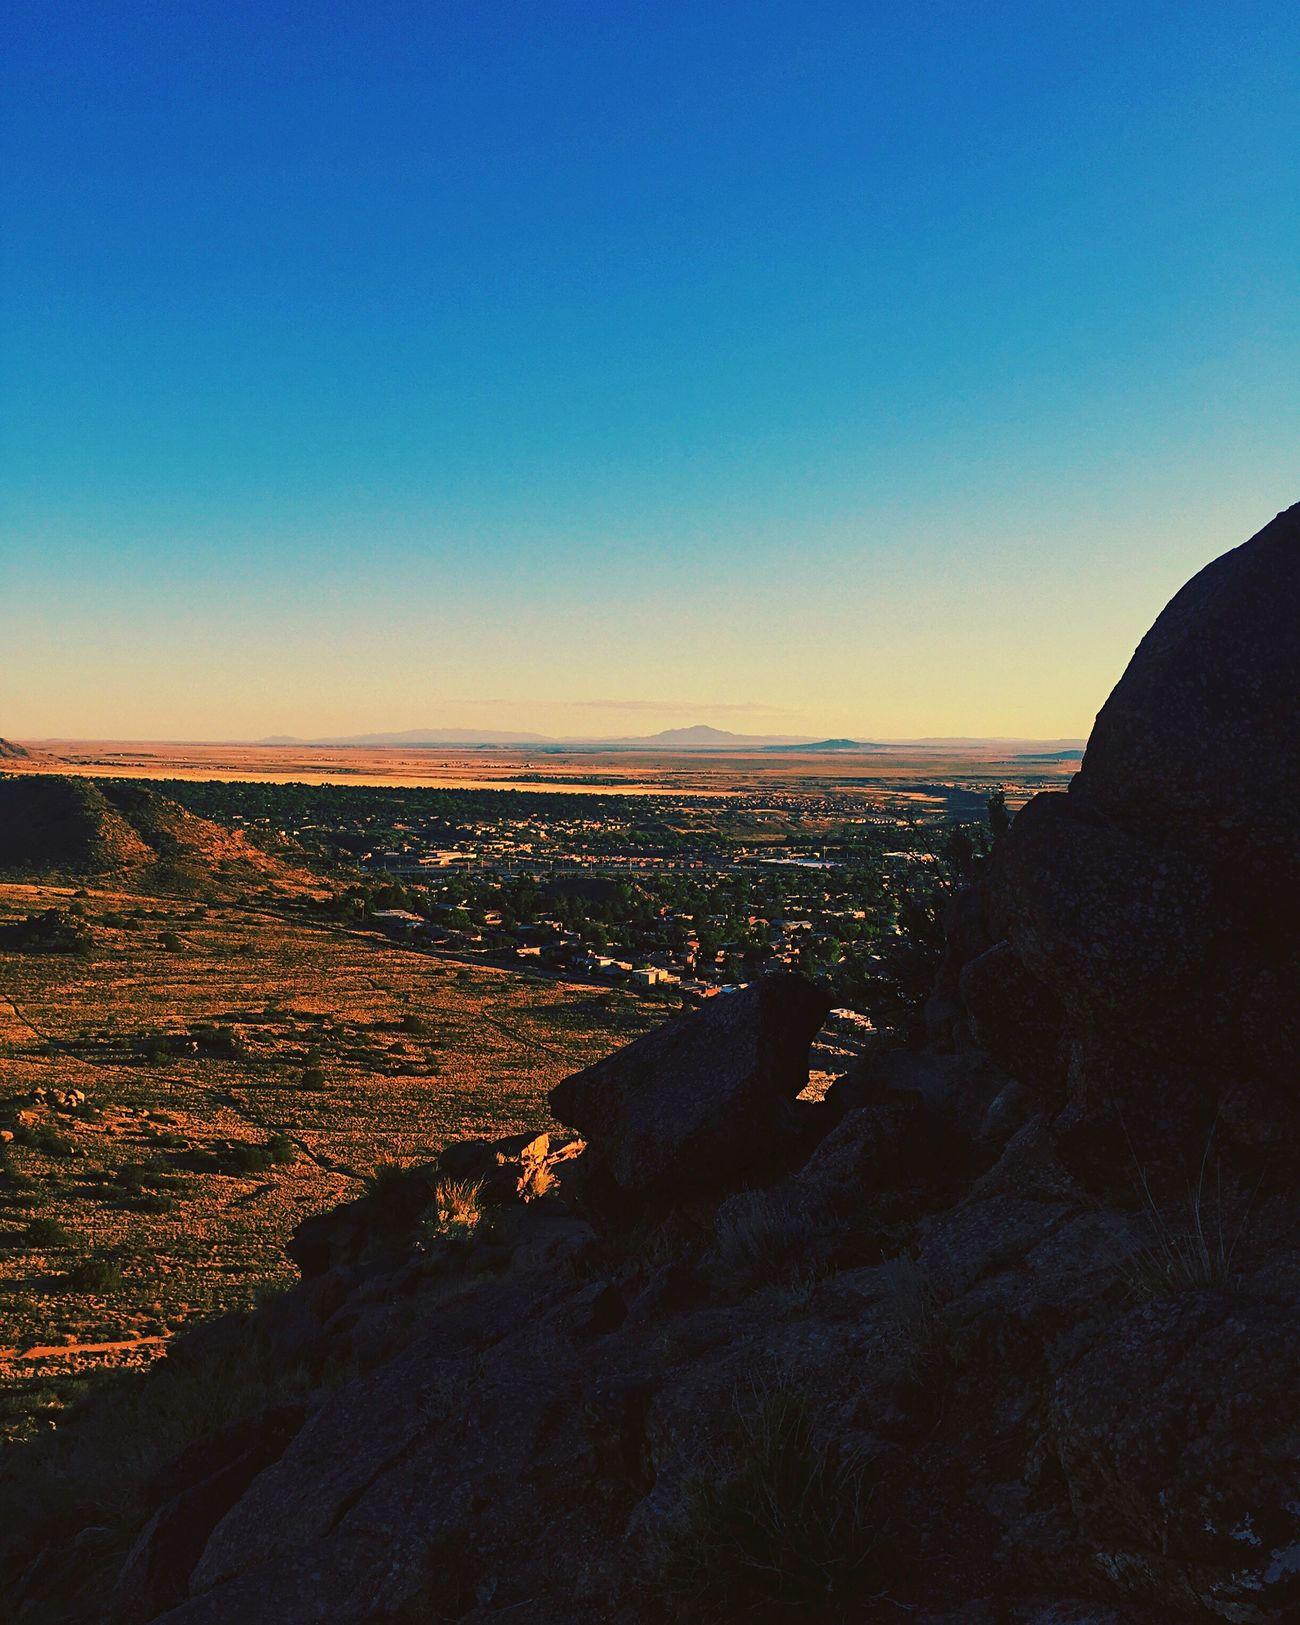 Albuquerque New Mexico Landofenchantment Sandia Mountains Mountains Tranquil Scene Beauty In Nature Landscape Sky Cityscape Suburbia Photography Foothills Suburban Landscape Neighborhood Mountain Southwest  Suburbs Geology Blue Sky Photographylovers Photography Themes Photographyislife Mountain Range Outdoors